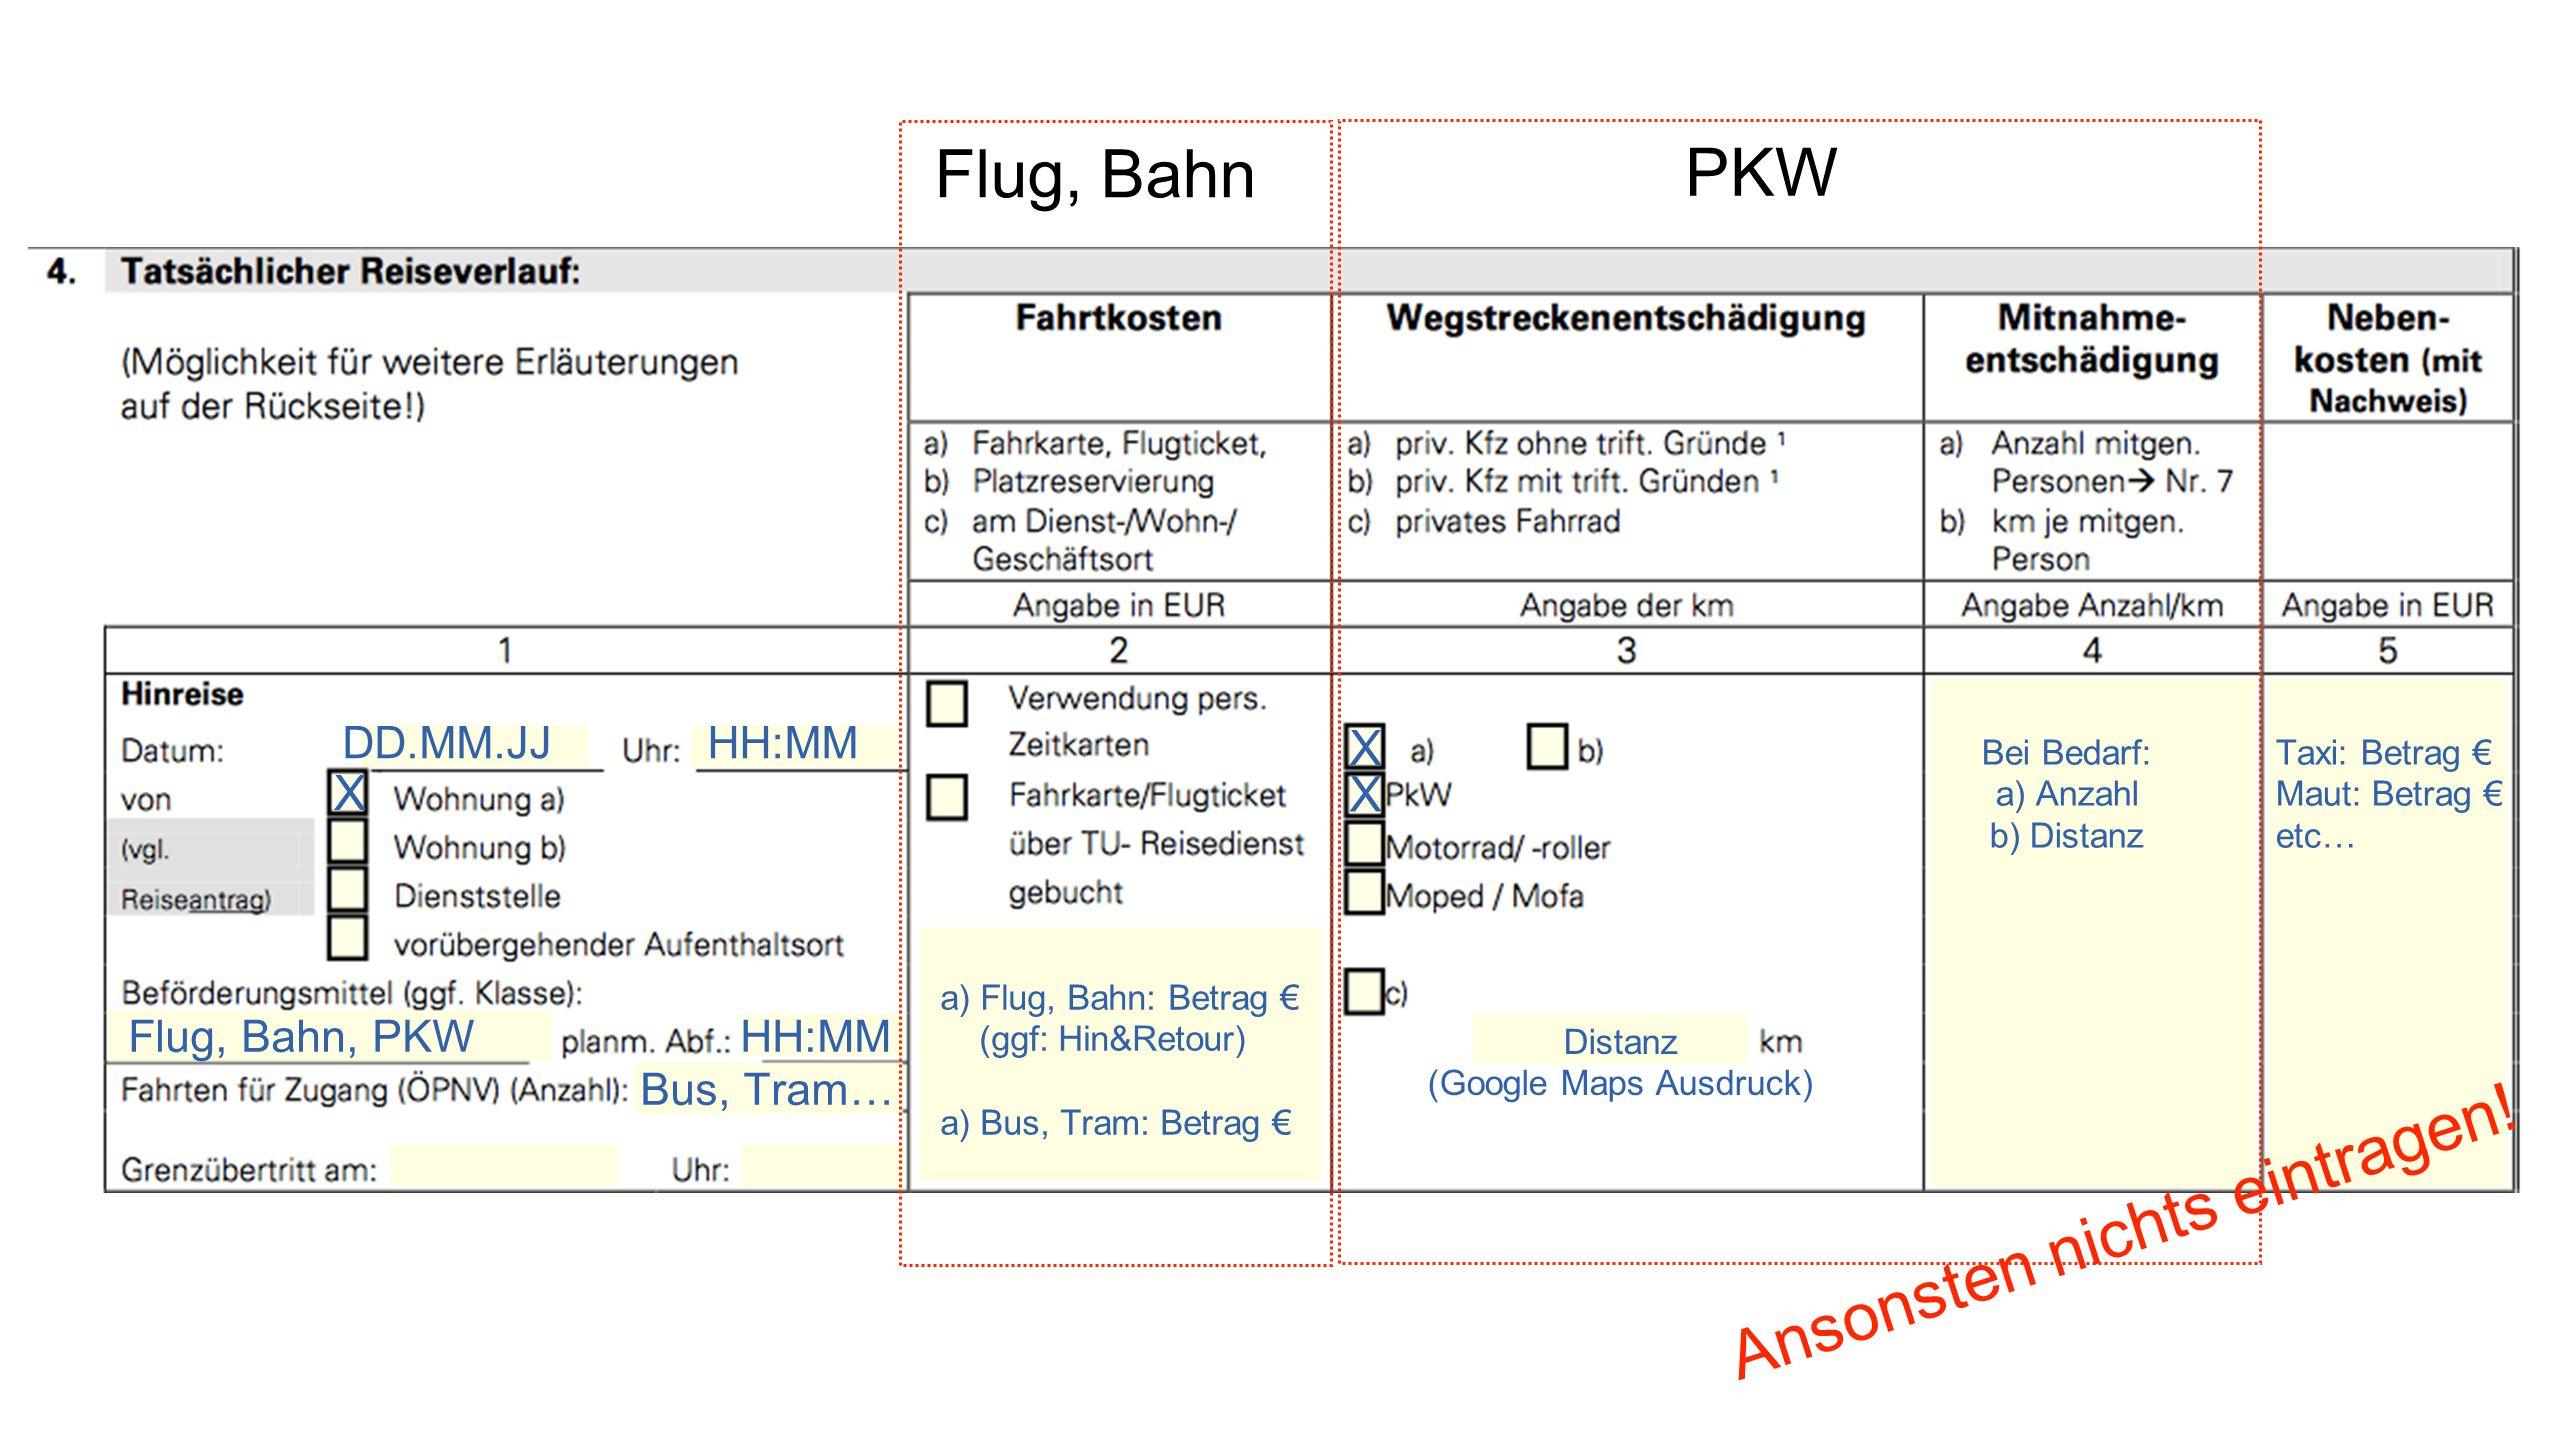 PKW DD.MM.JJHH:MM X Flug, Bahn, PKWHH:MM Bus, Tram… Flug, Bahn a) Flug, Bahn: Betrag € (ggf: Hin&Retour) a) Bus, Tram: Betrag € X X Distanz (Google Ma